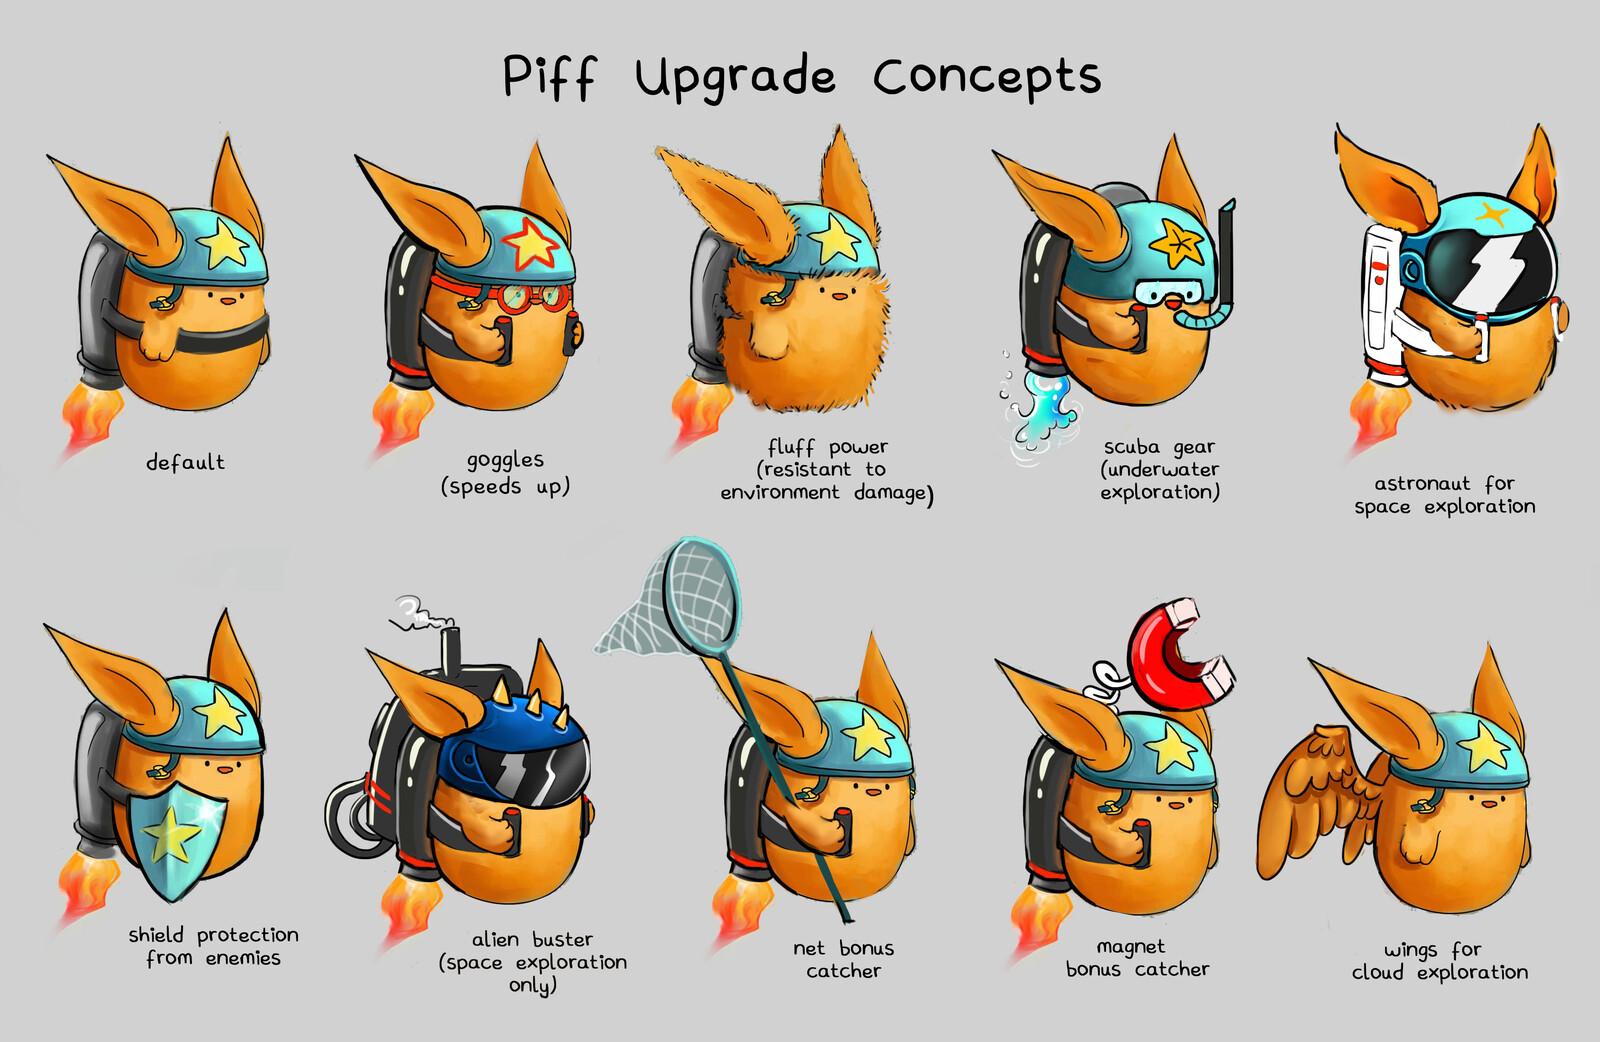 Piff Concepts